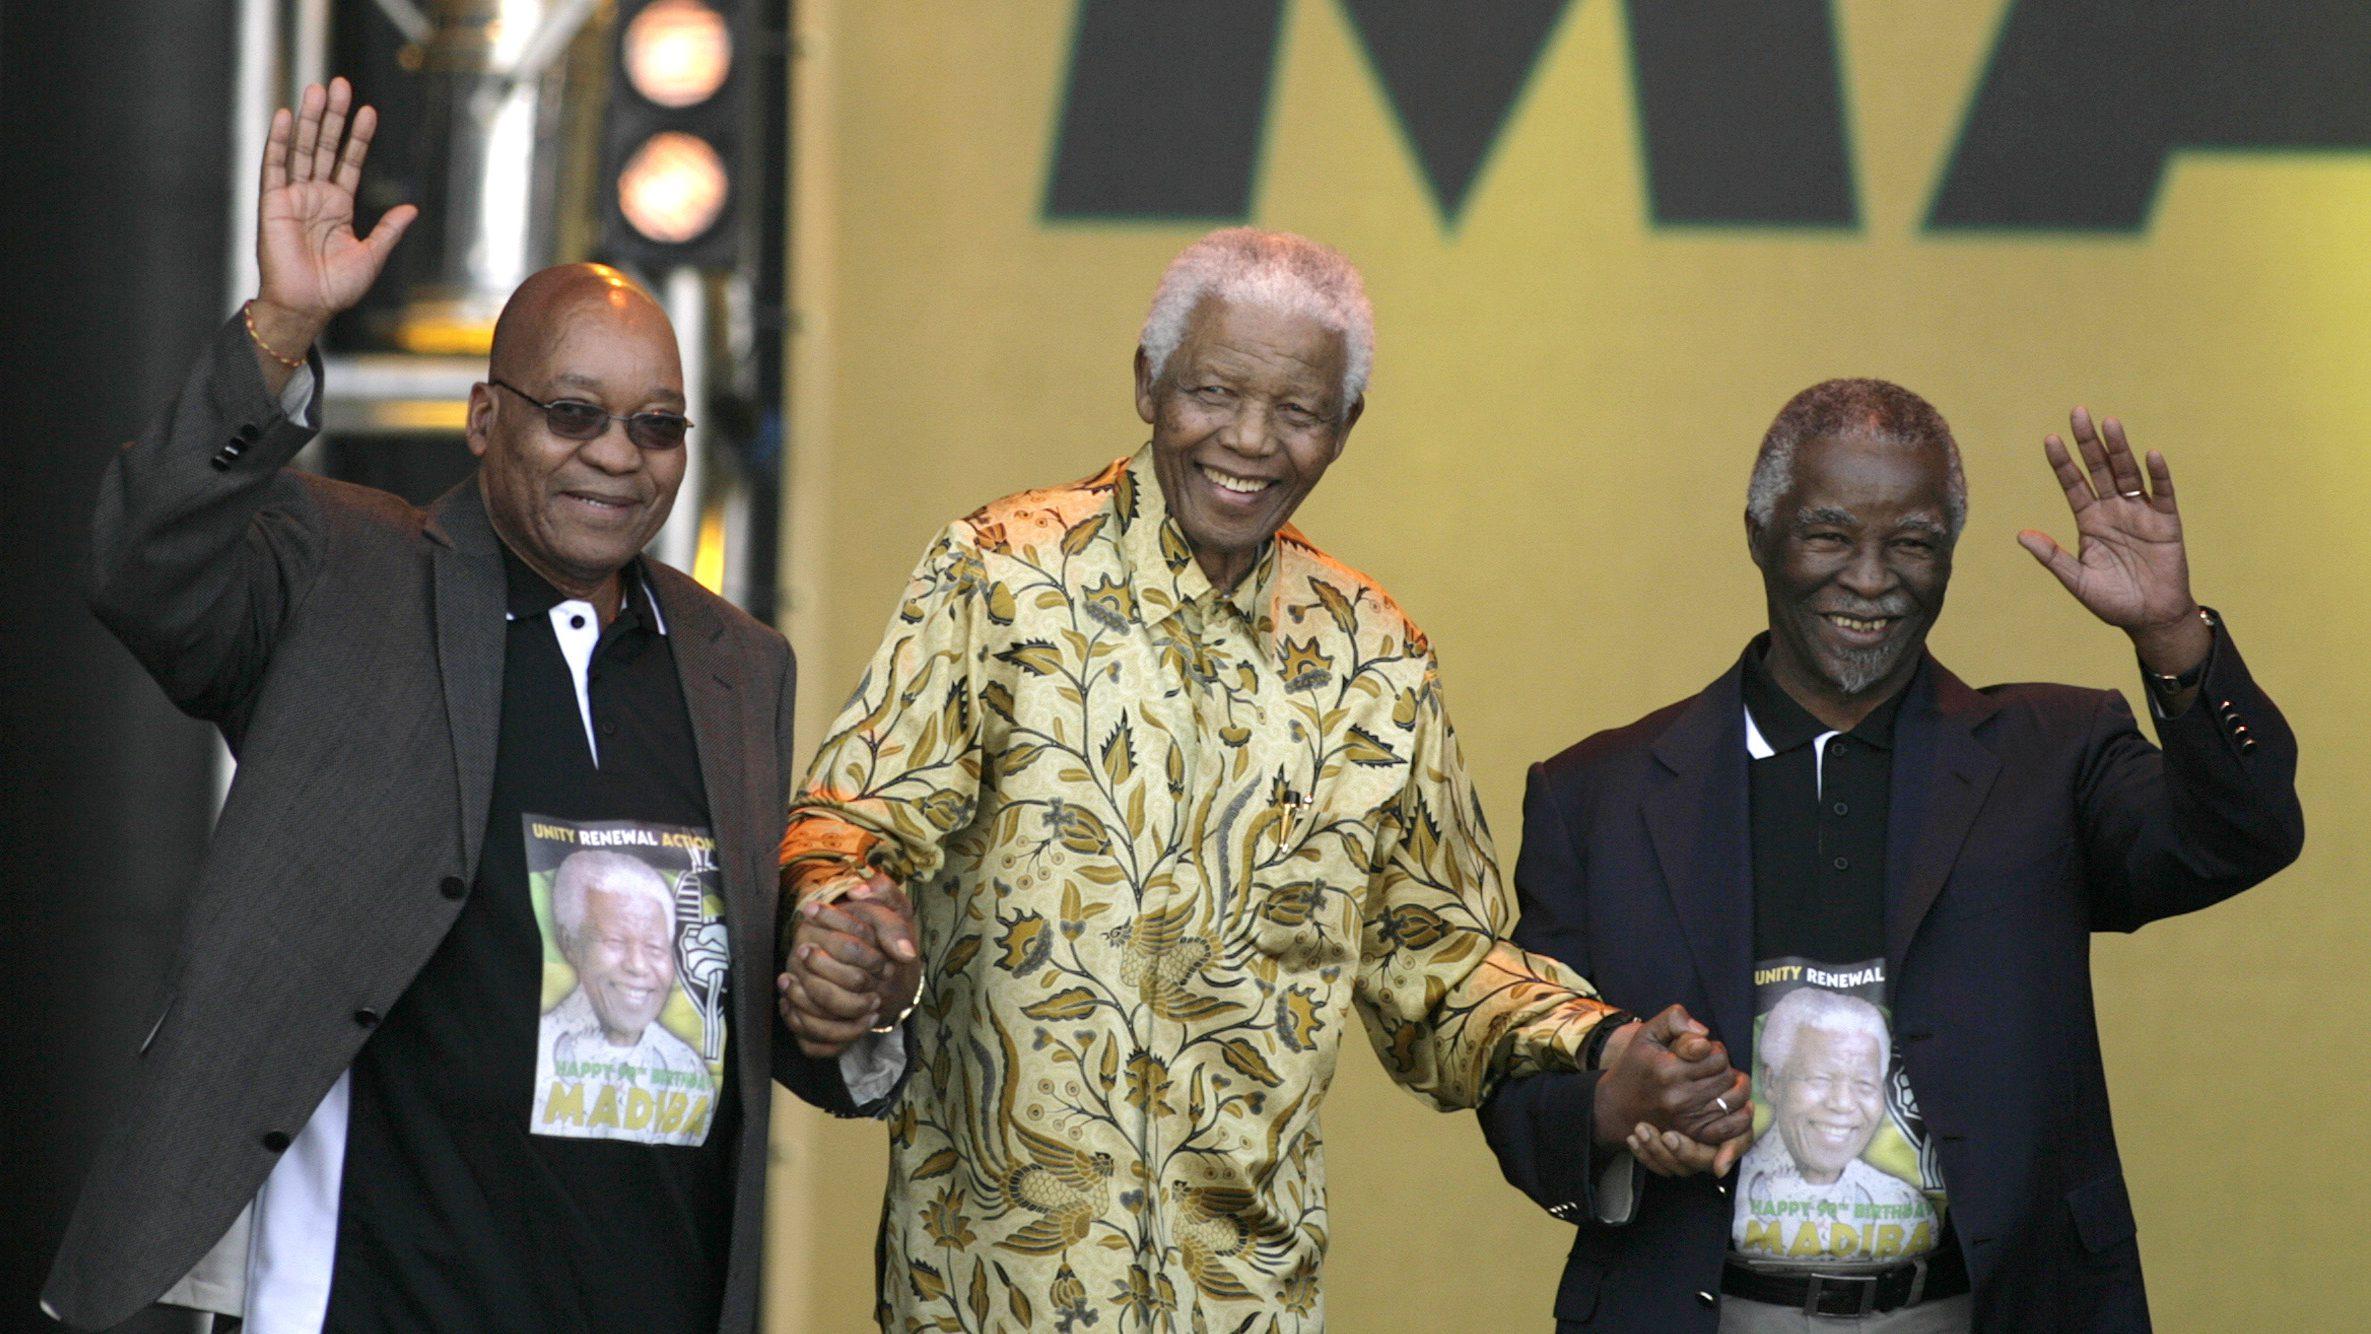 Nelson Mandela, Jacob Zuma and Thabo Mbeki appear at a rally in Pretoria in 2008 to celebrate Mandelas 90th birthday.